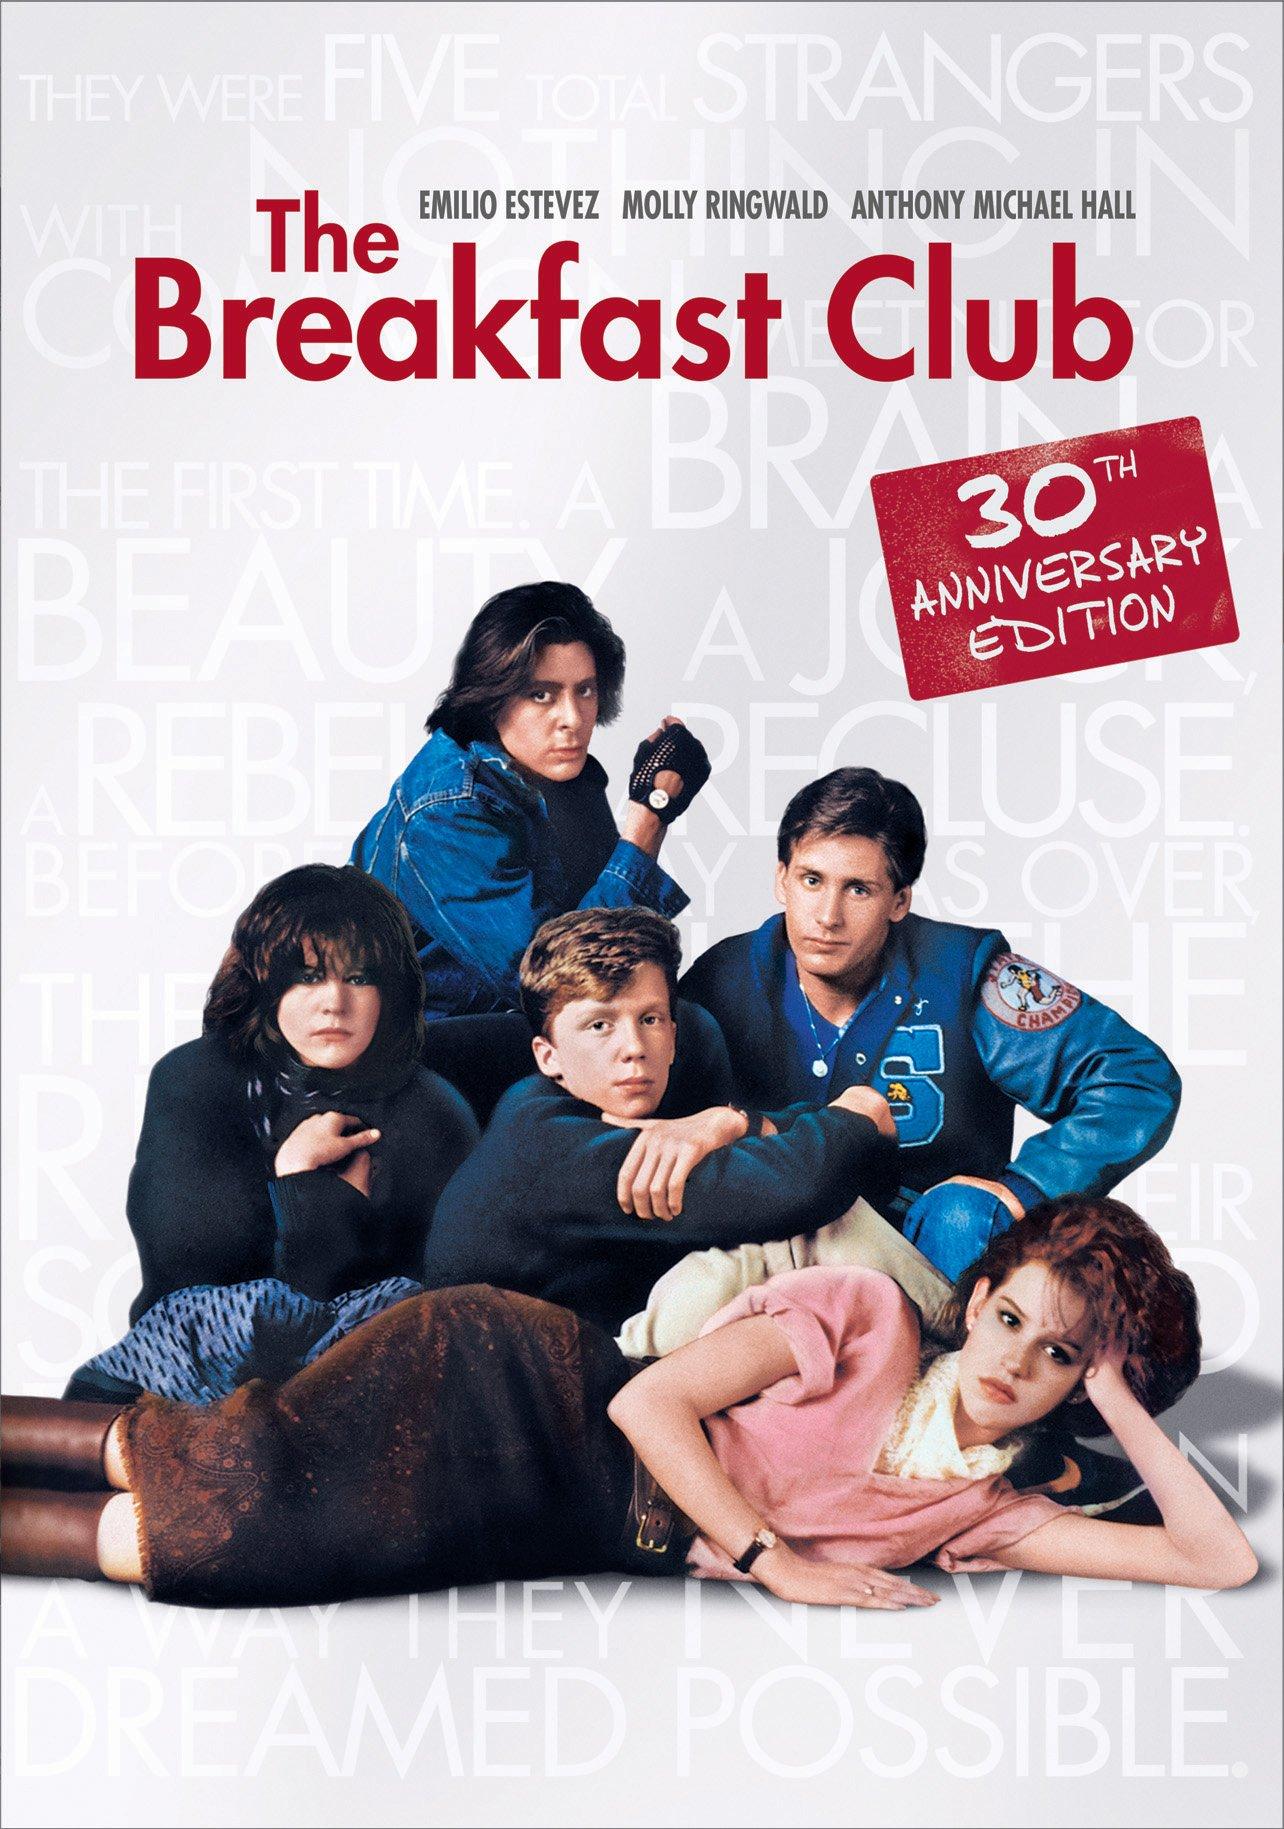 The Breakfast Club - 30th Anniversary Edition